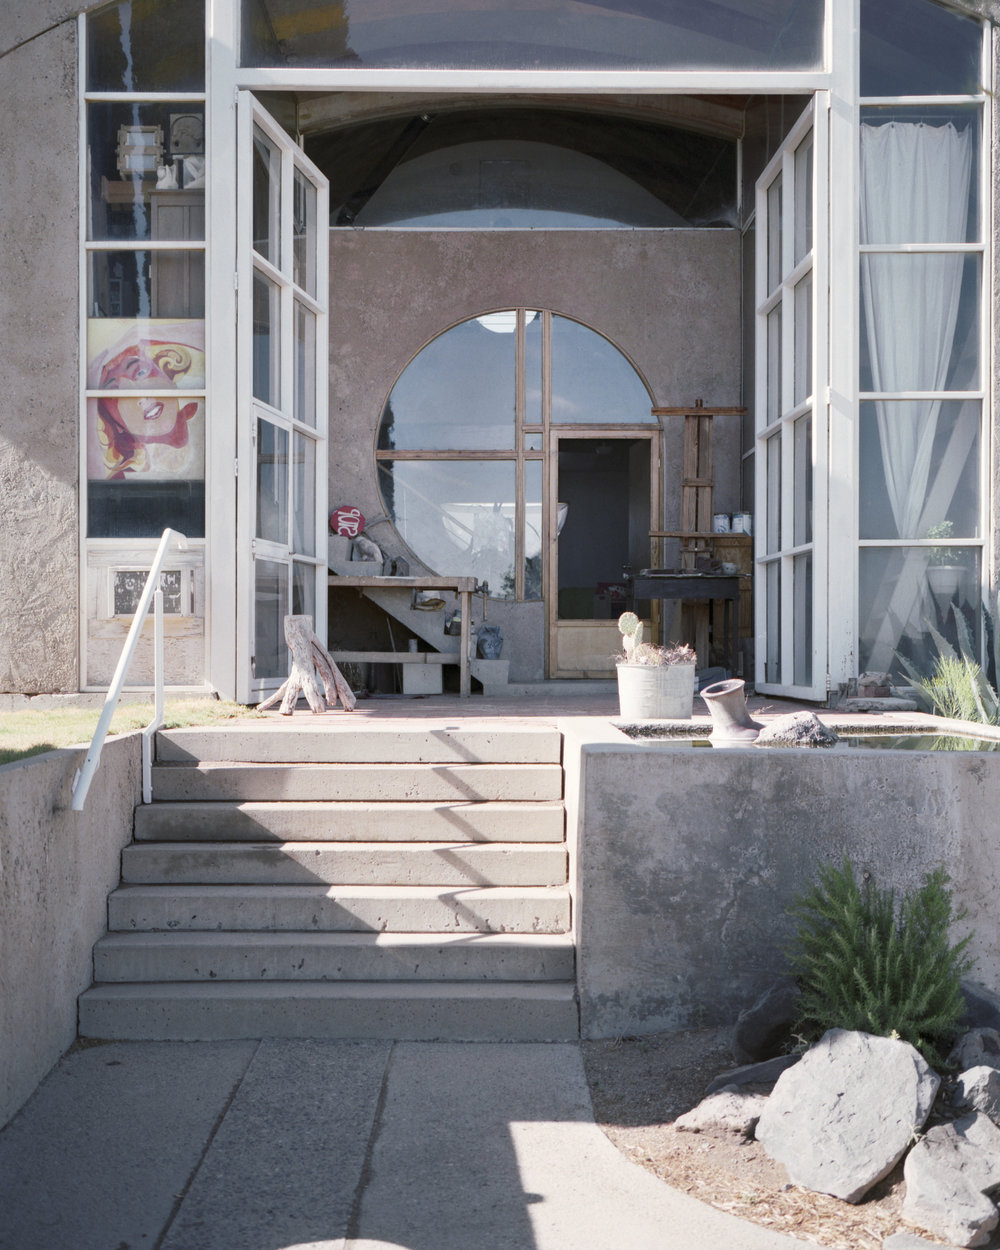 archaic_AlbertoSinigaglia_Arcosanti14.jpg